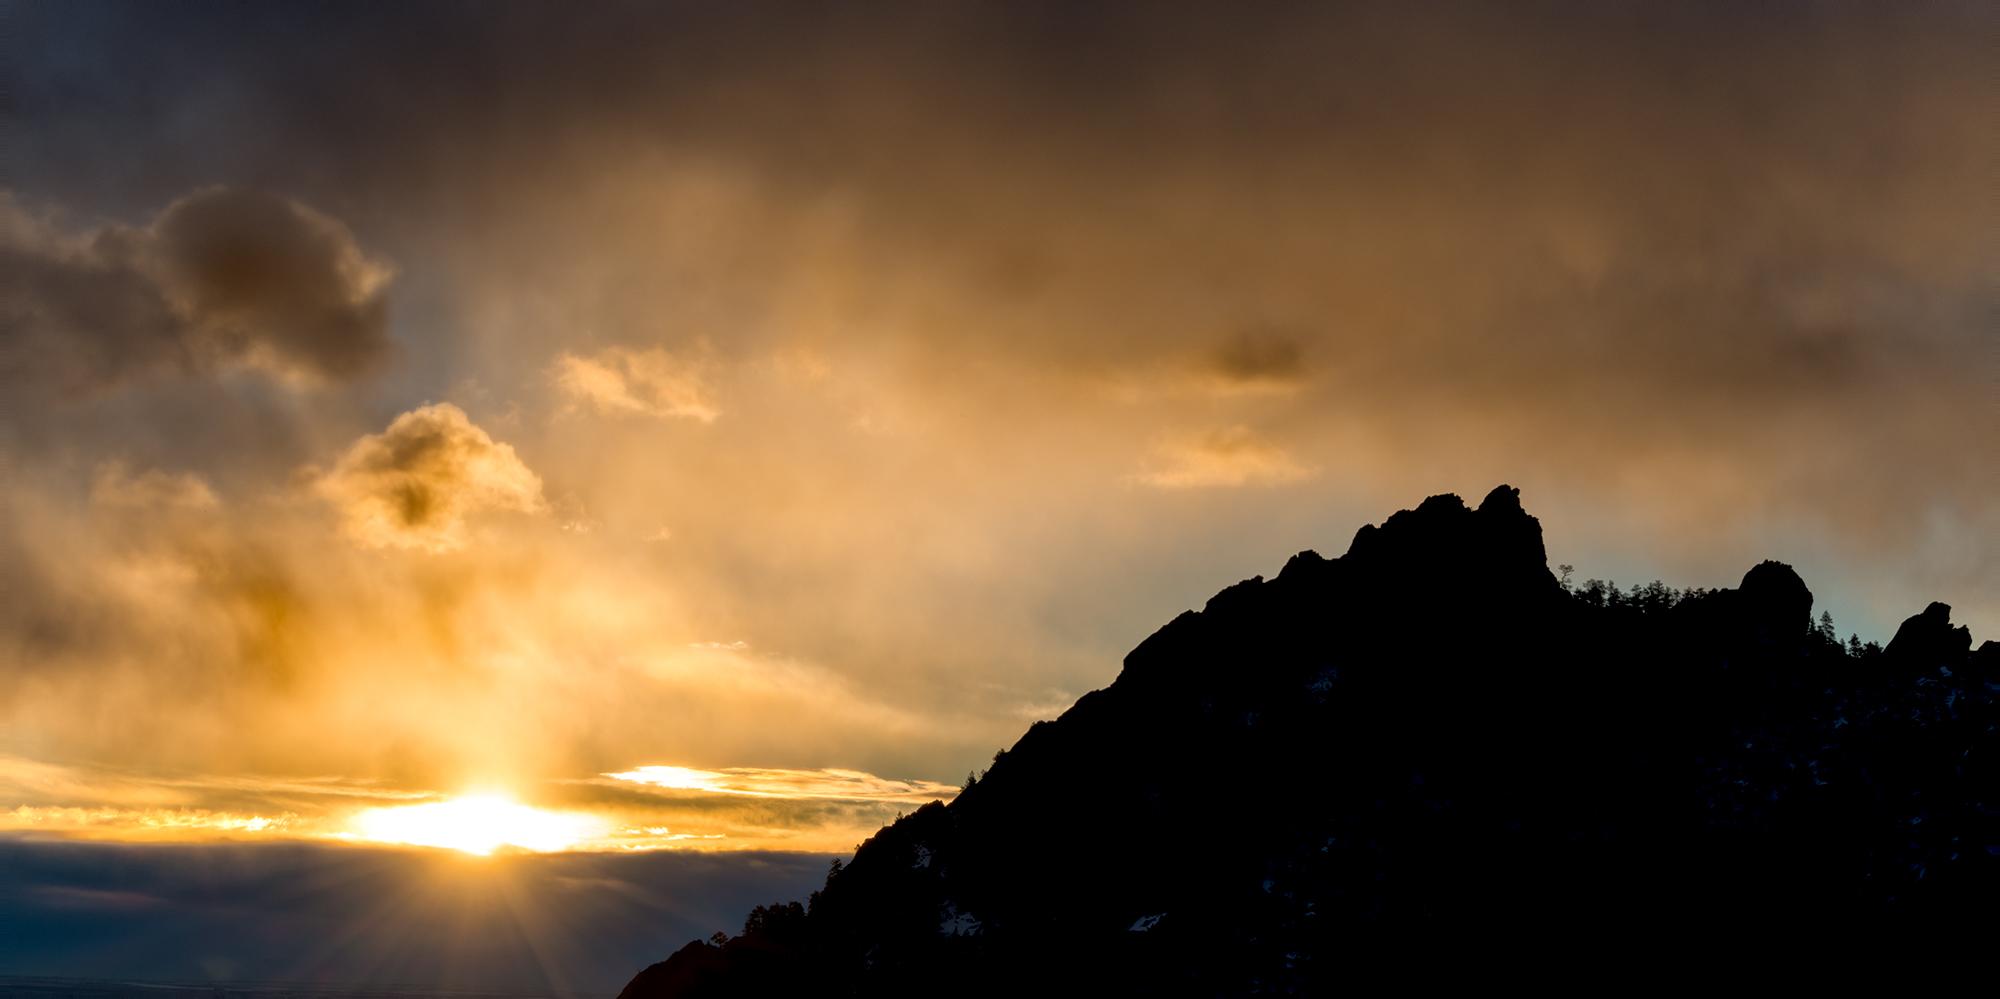 Sunrise, First Flatiron Profile. Boulder, Colorado, 2015